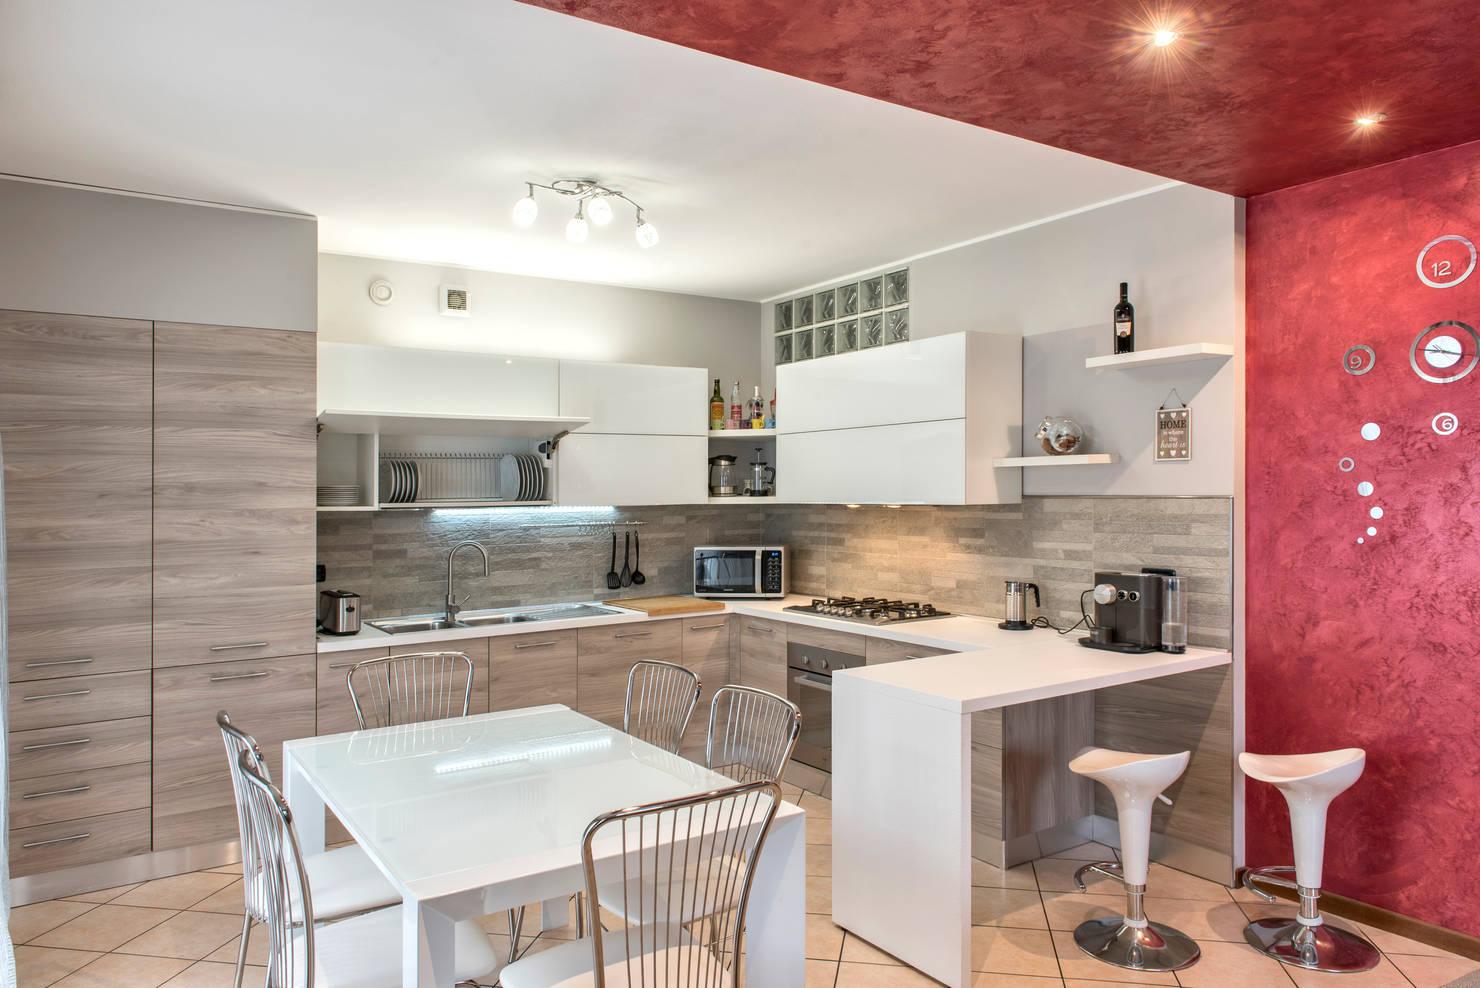 Una cocina moderna hecha a medida